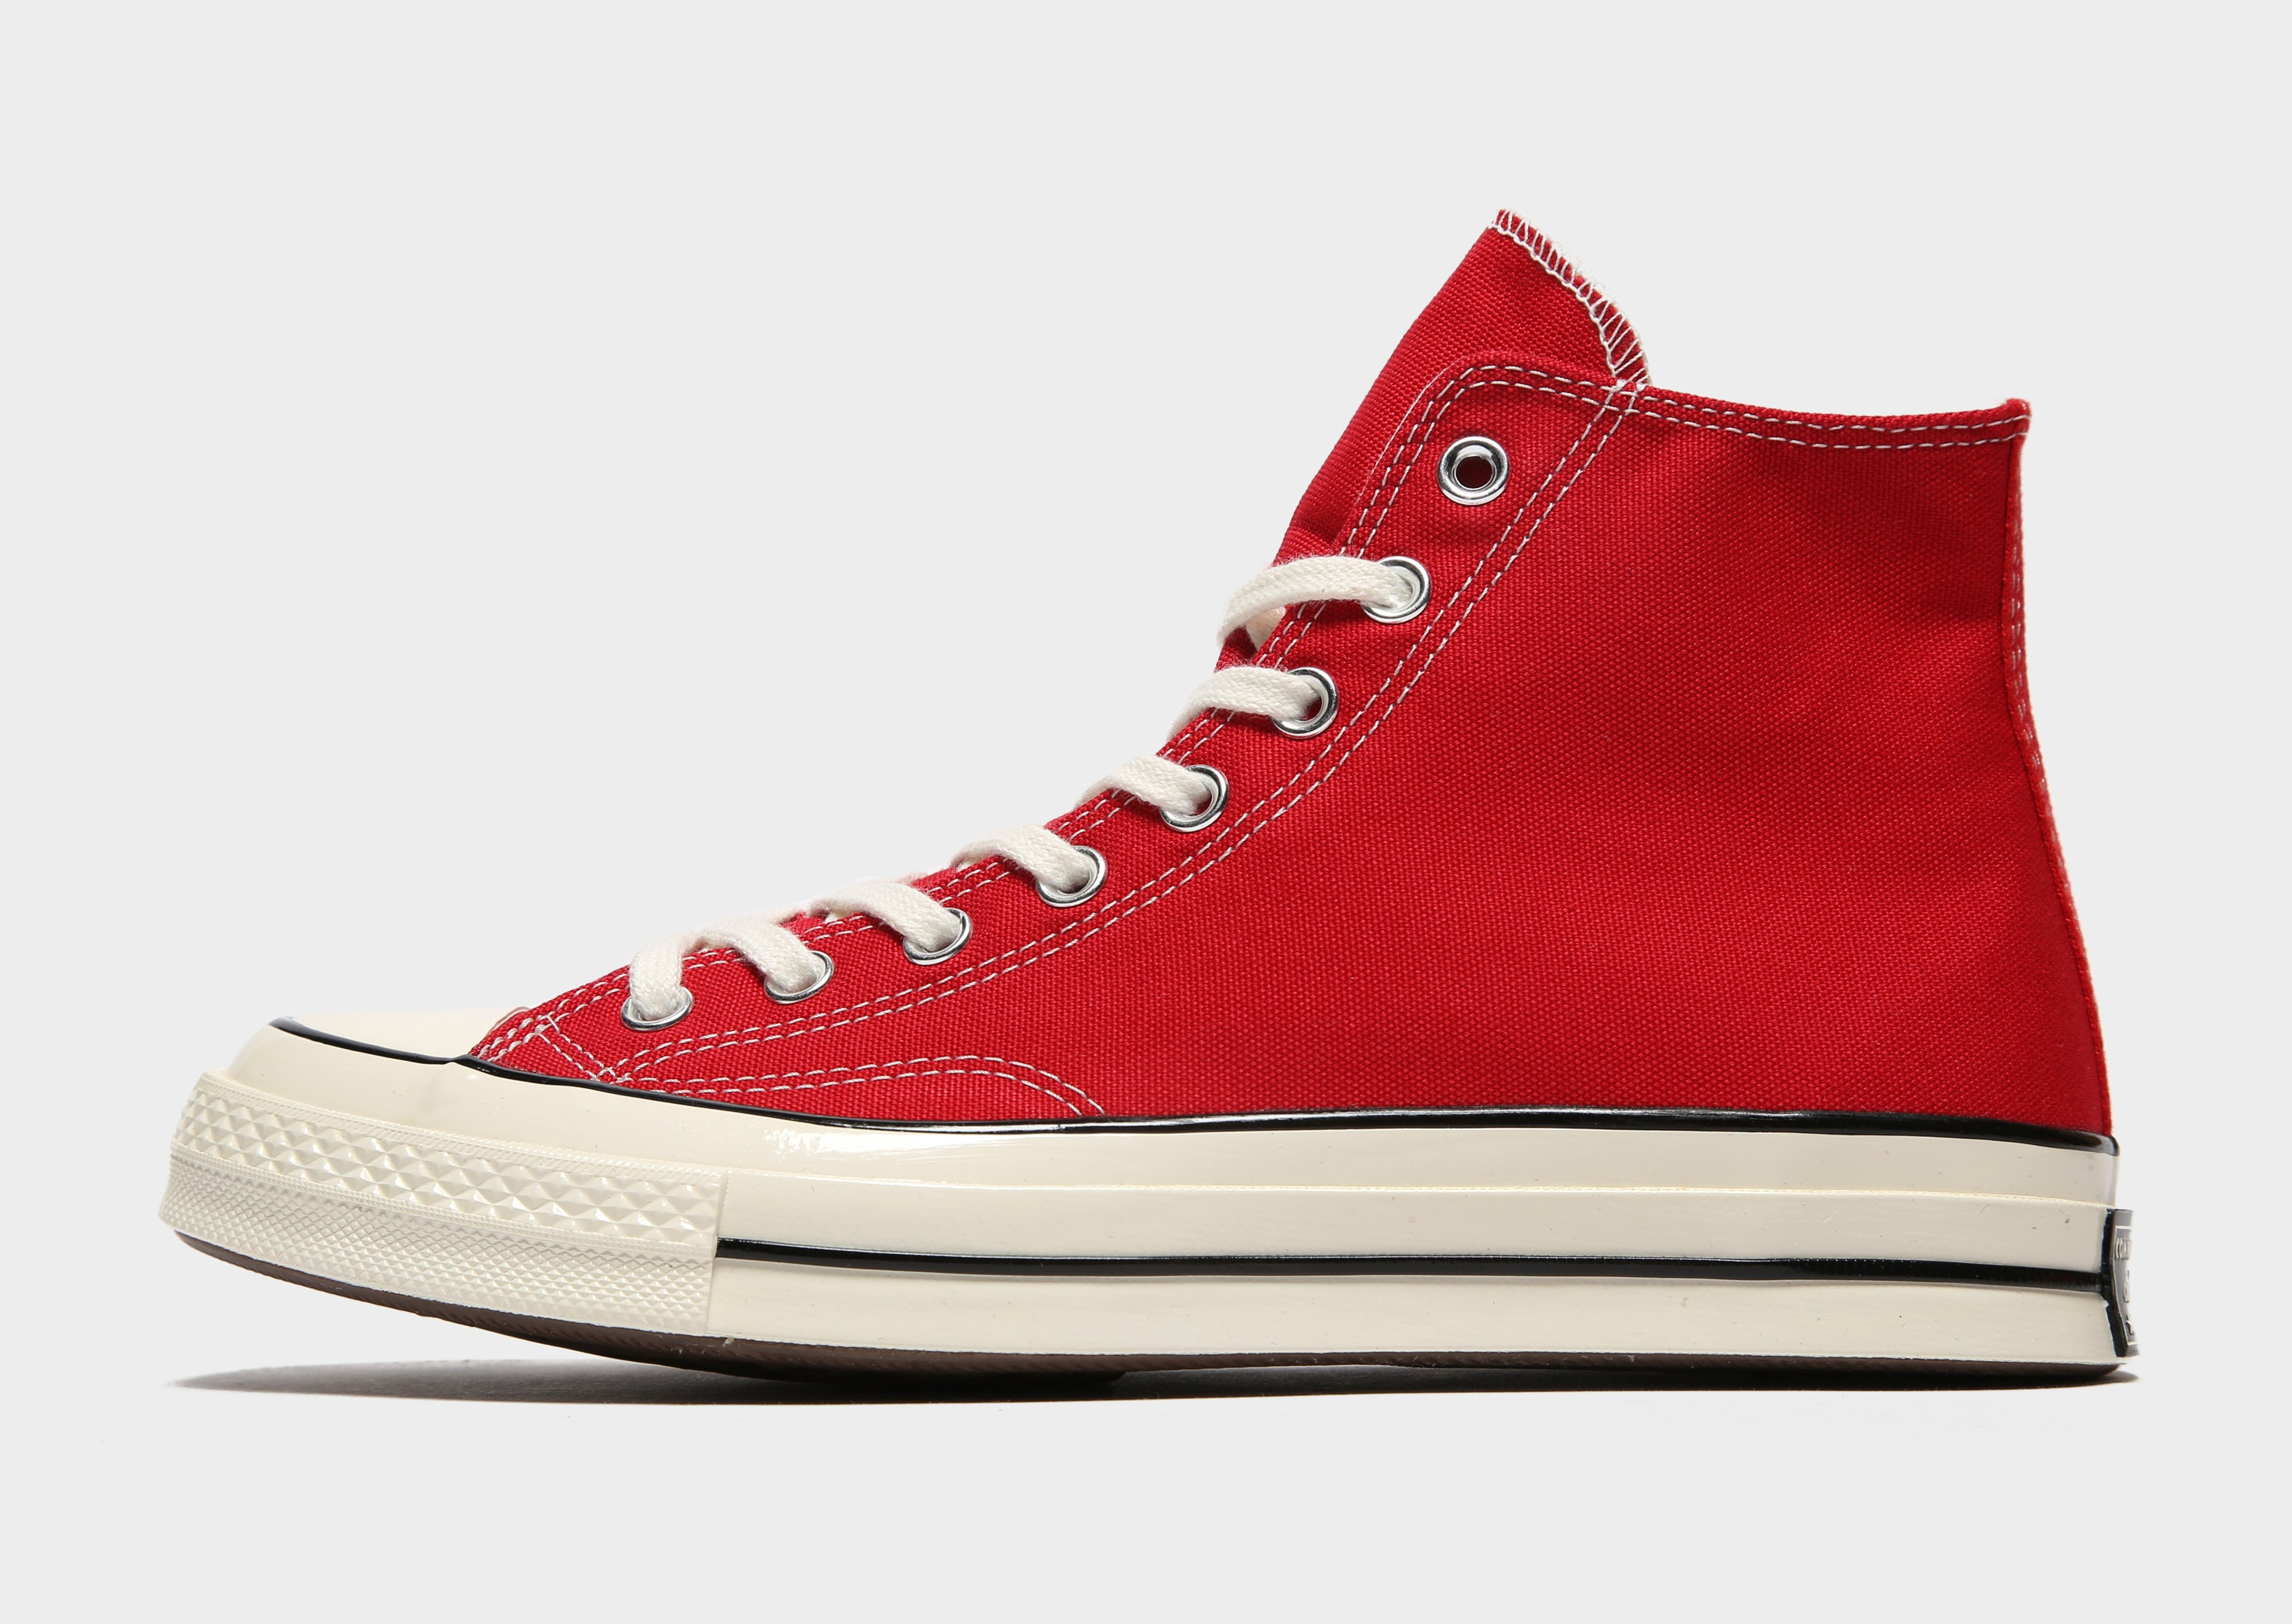 collar Cien años Príncipe  Red Converse Chuck Taylor All Star 70's High | JD Sports